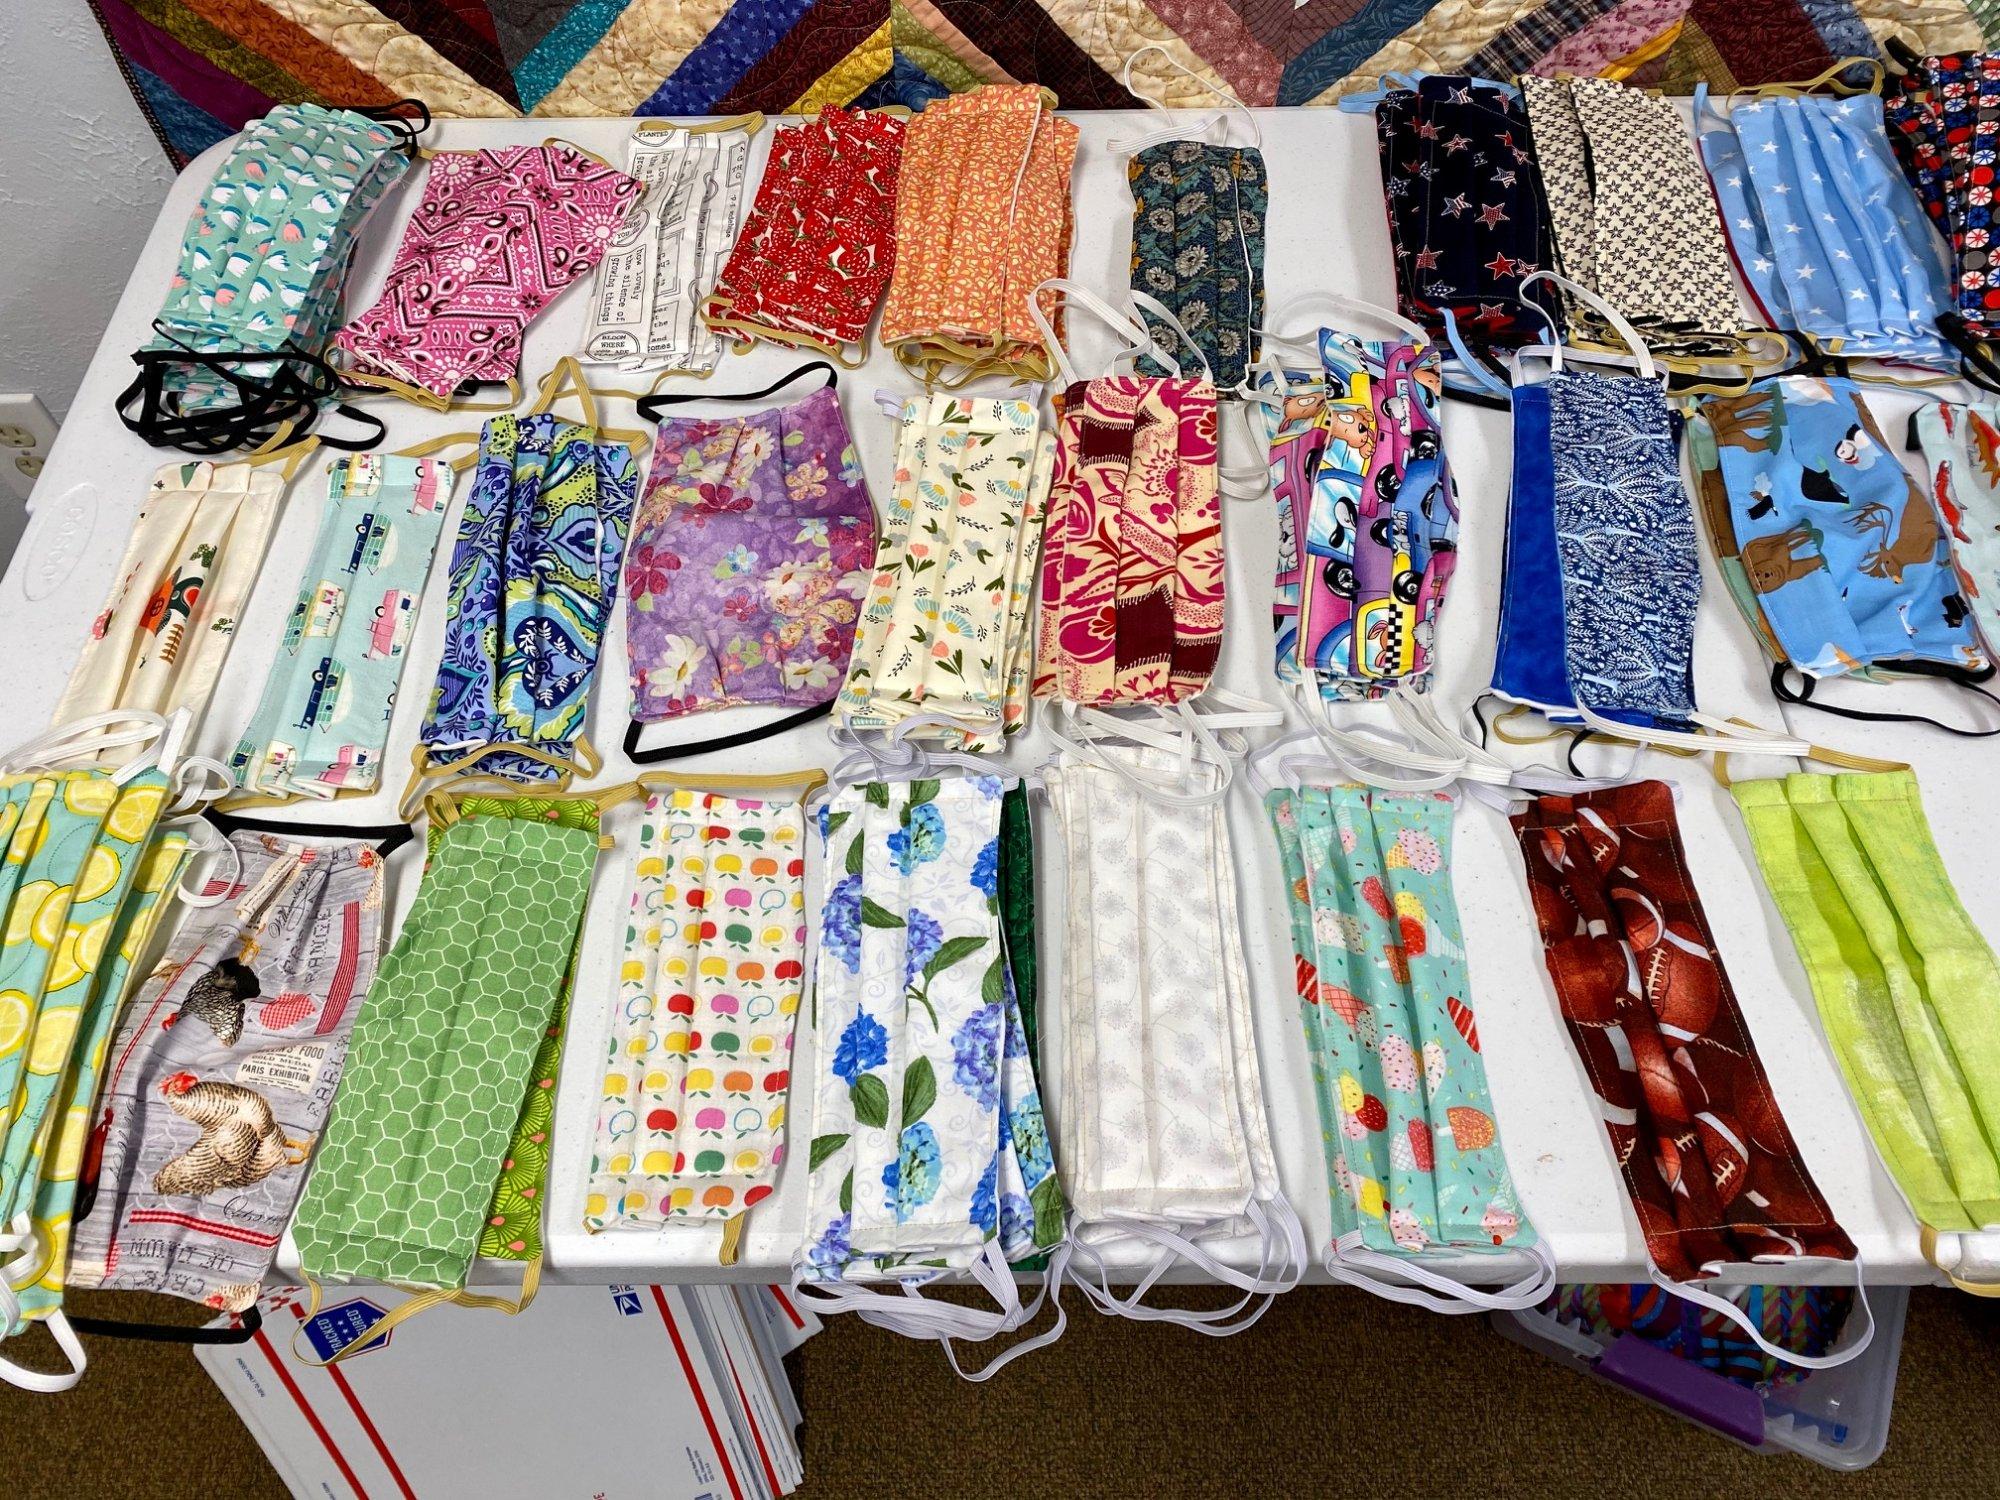 Designer Face Mask - Designer Fabric, Unisex - Made by Cotton Candy Fabrics